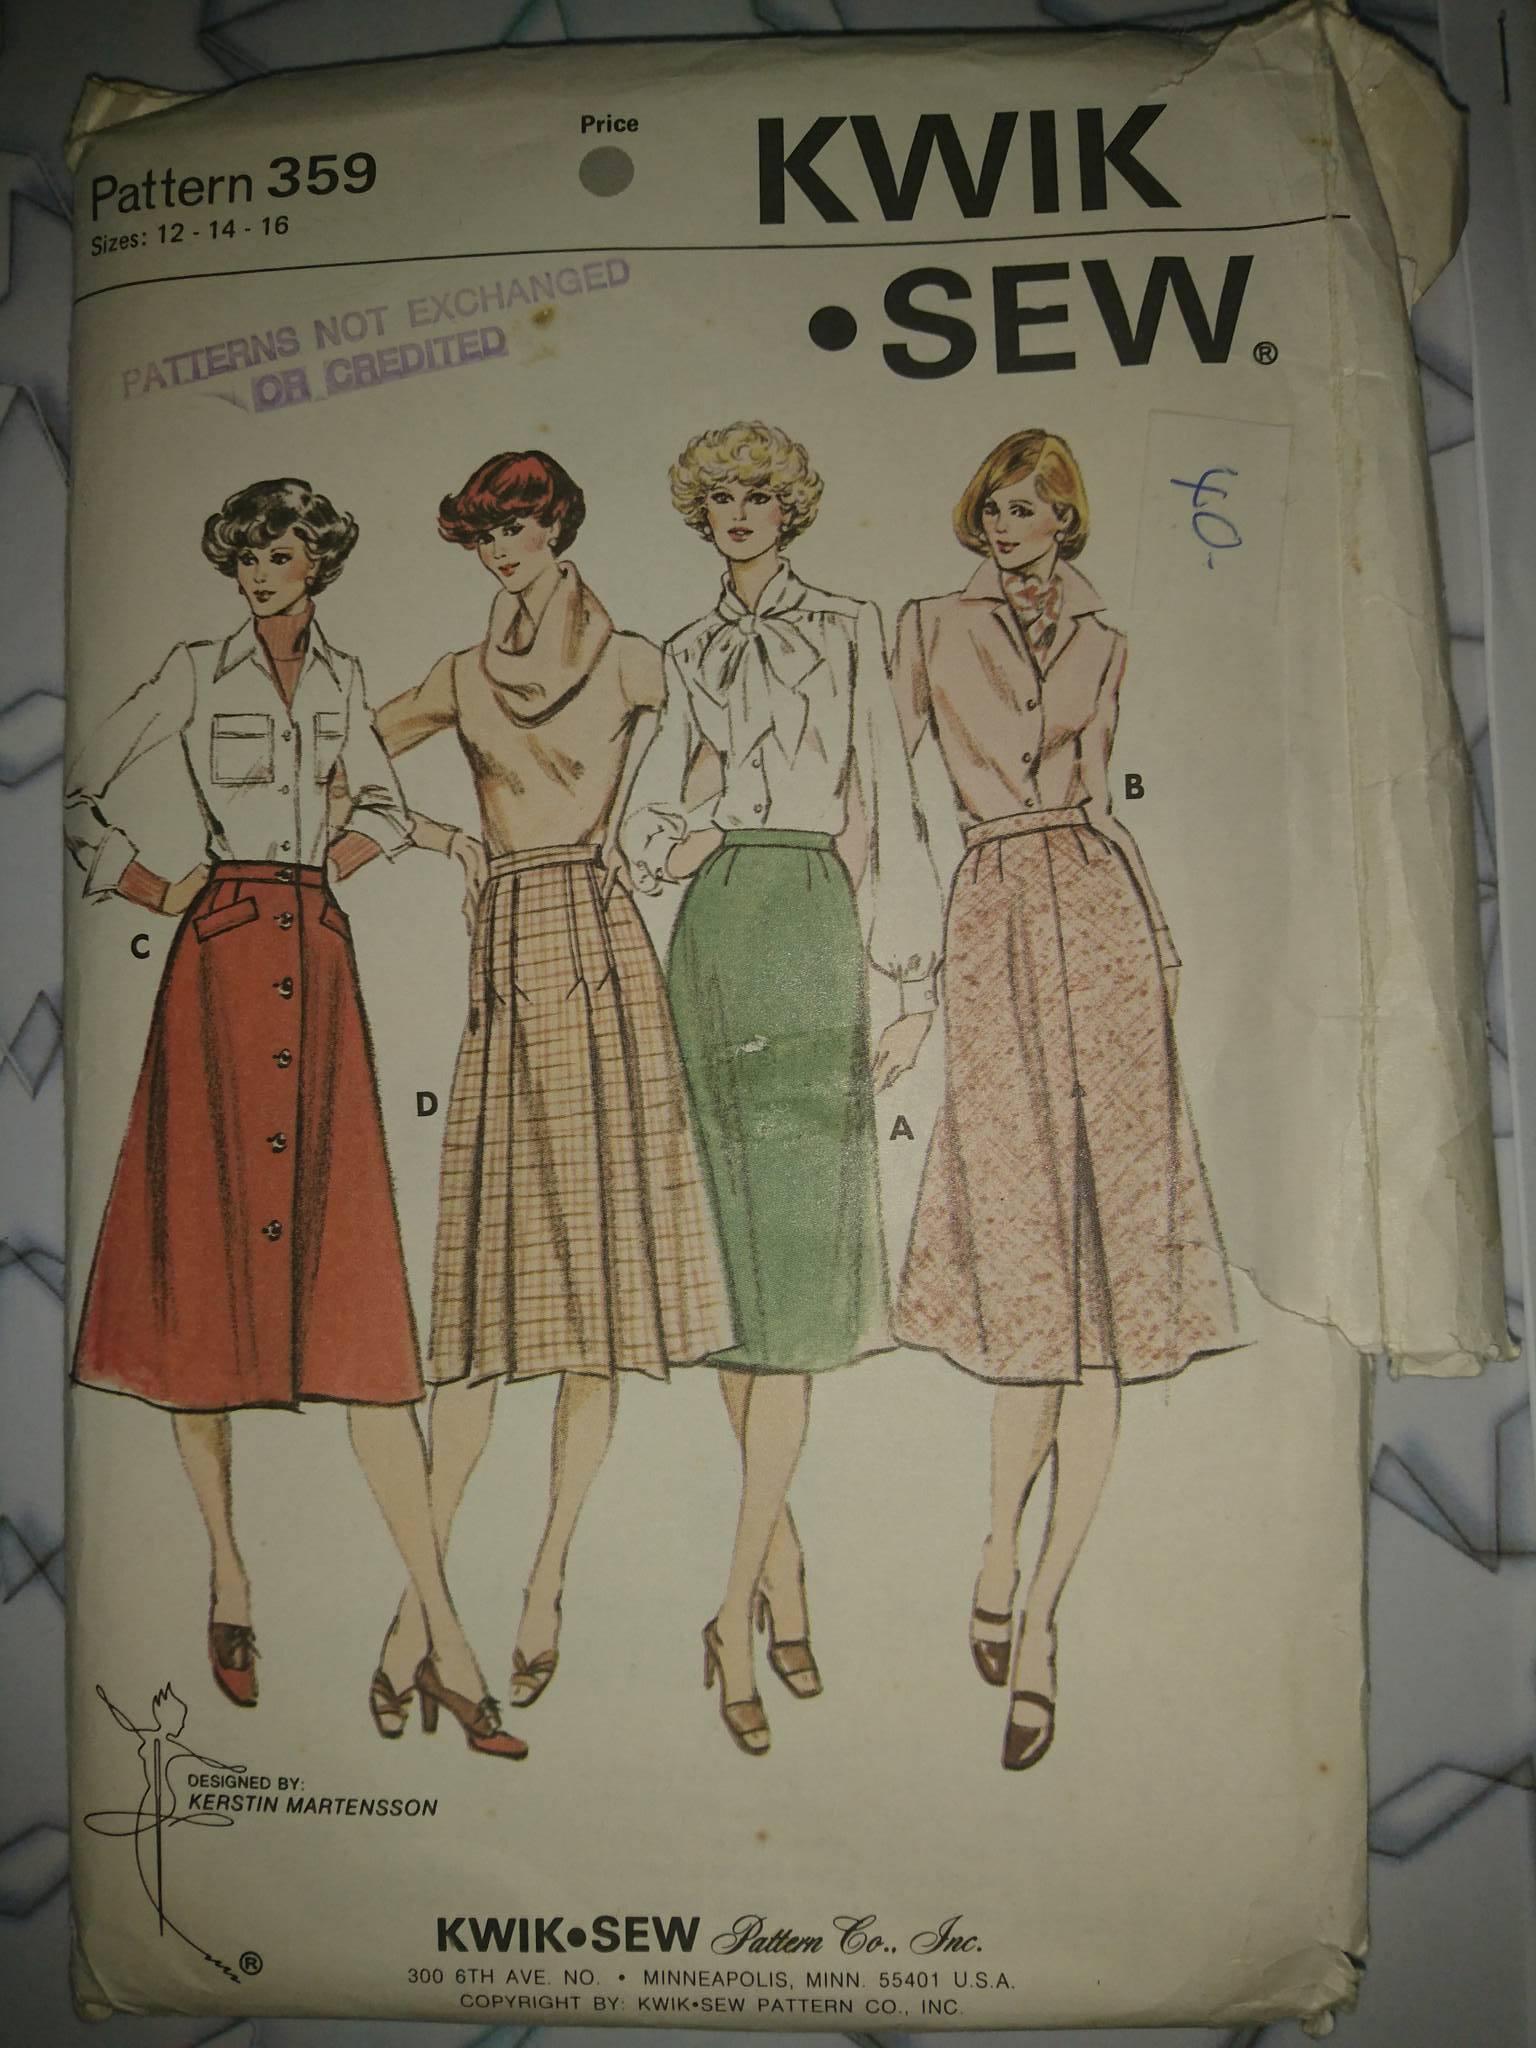 Kwik Sew 359